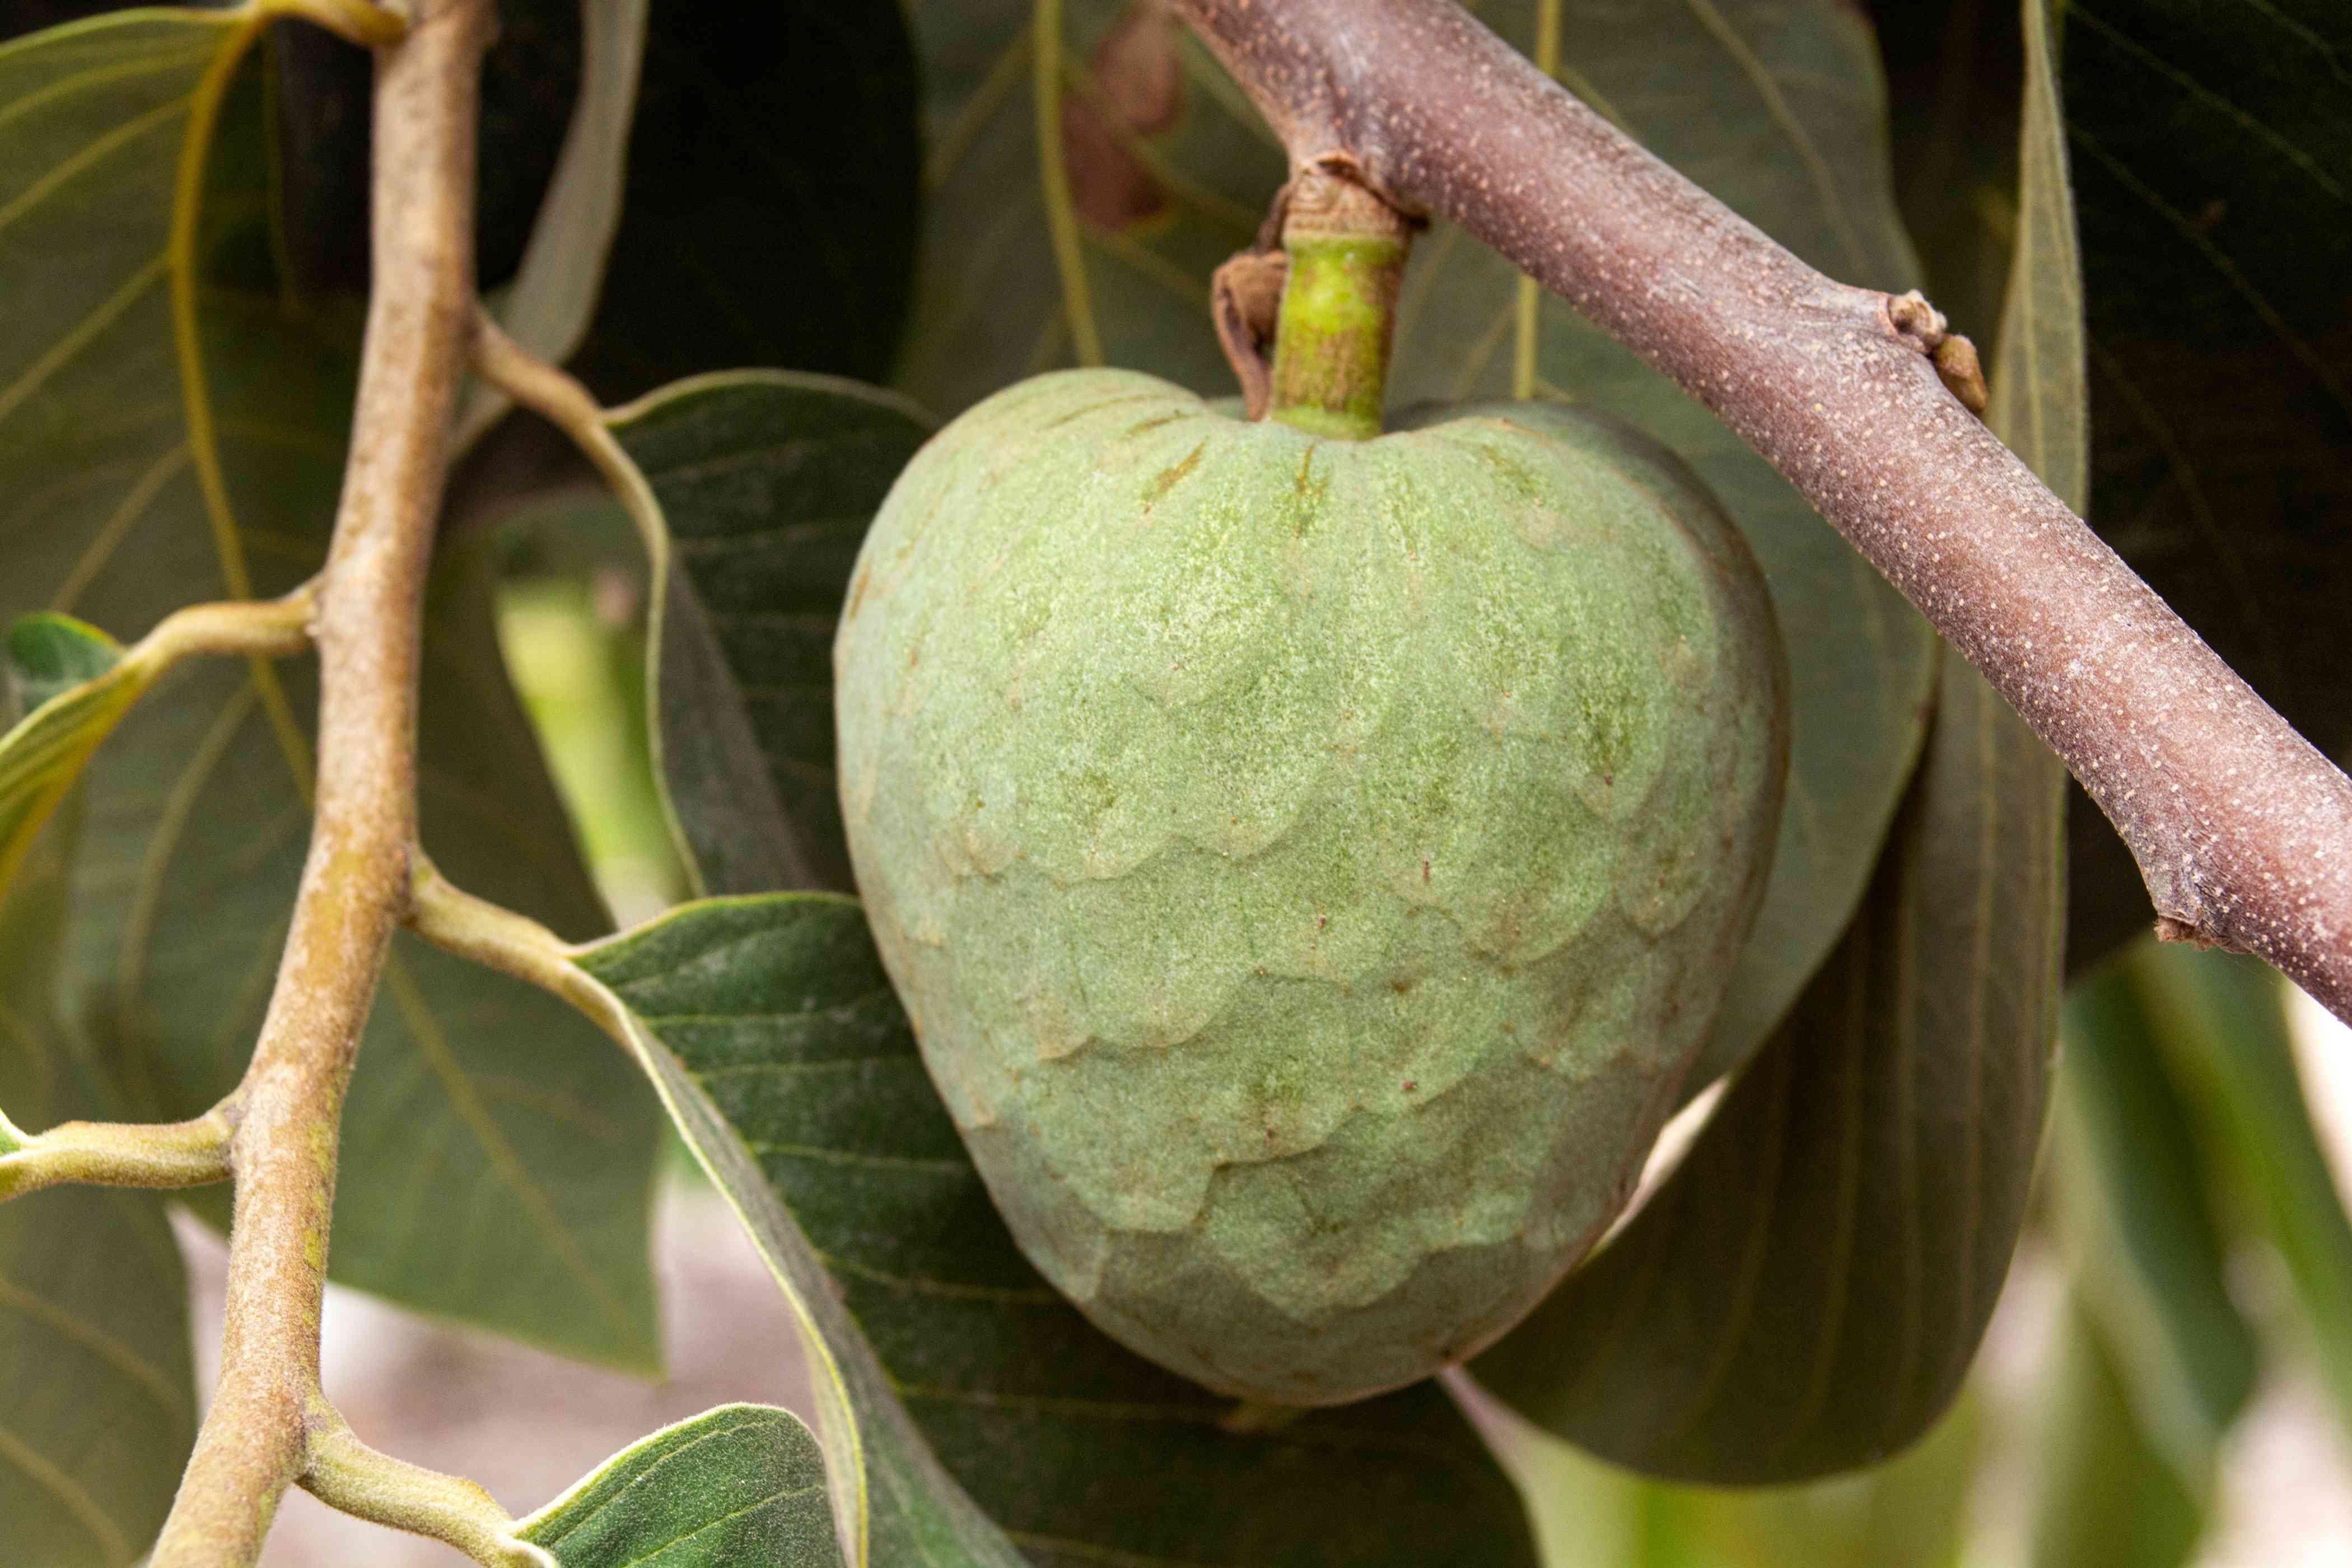 Cherimoya heart-shaped light green fruit hanging from branch closeup